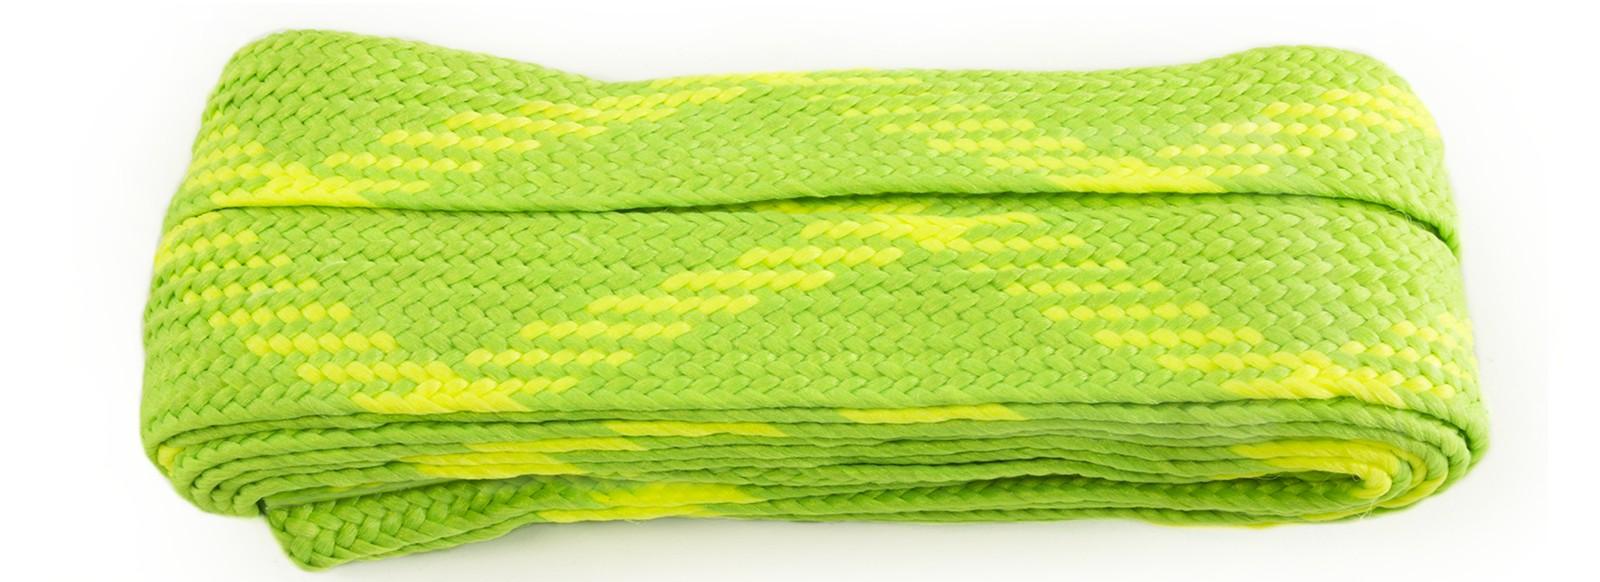 Flo Green/flo Yellow Fat Laces